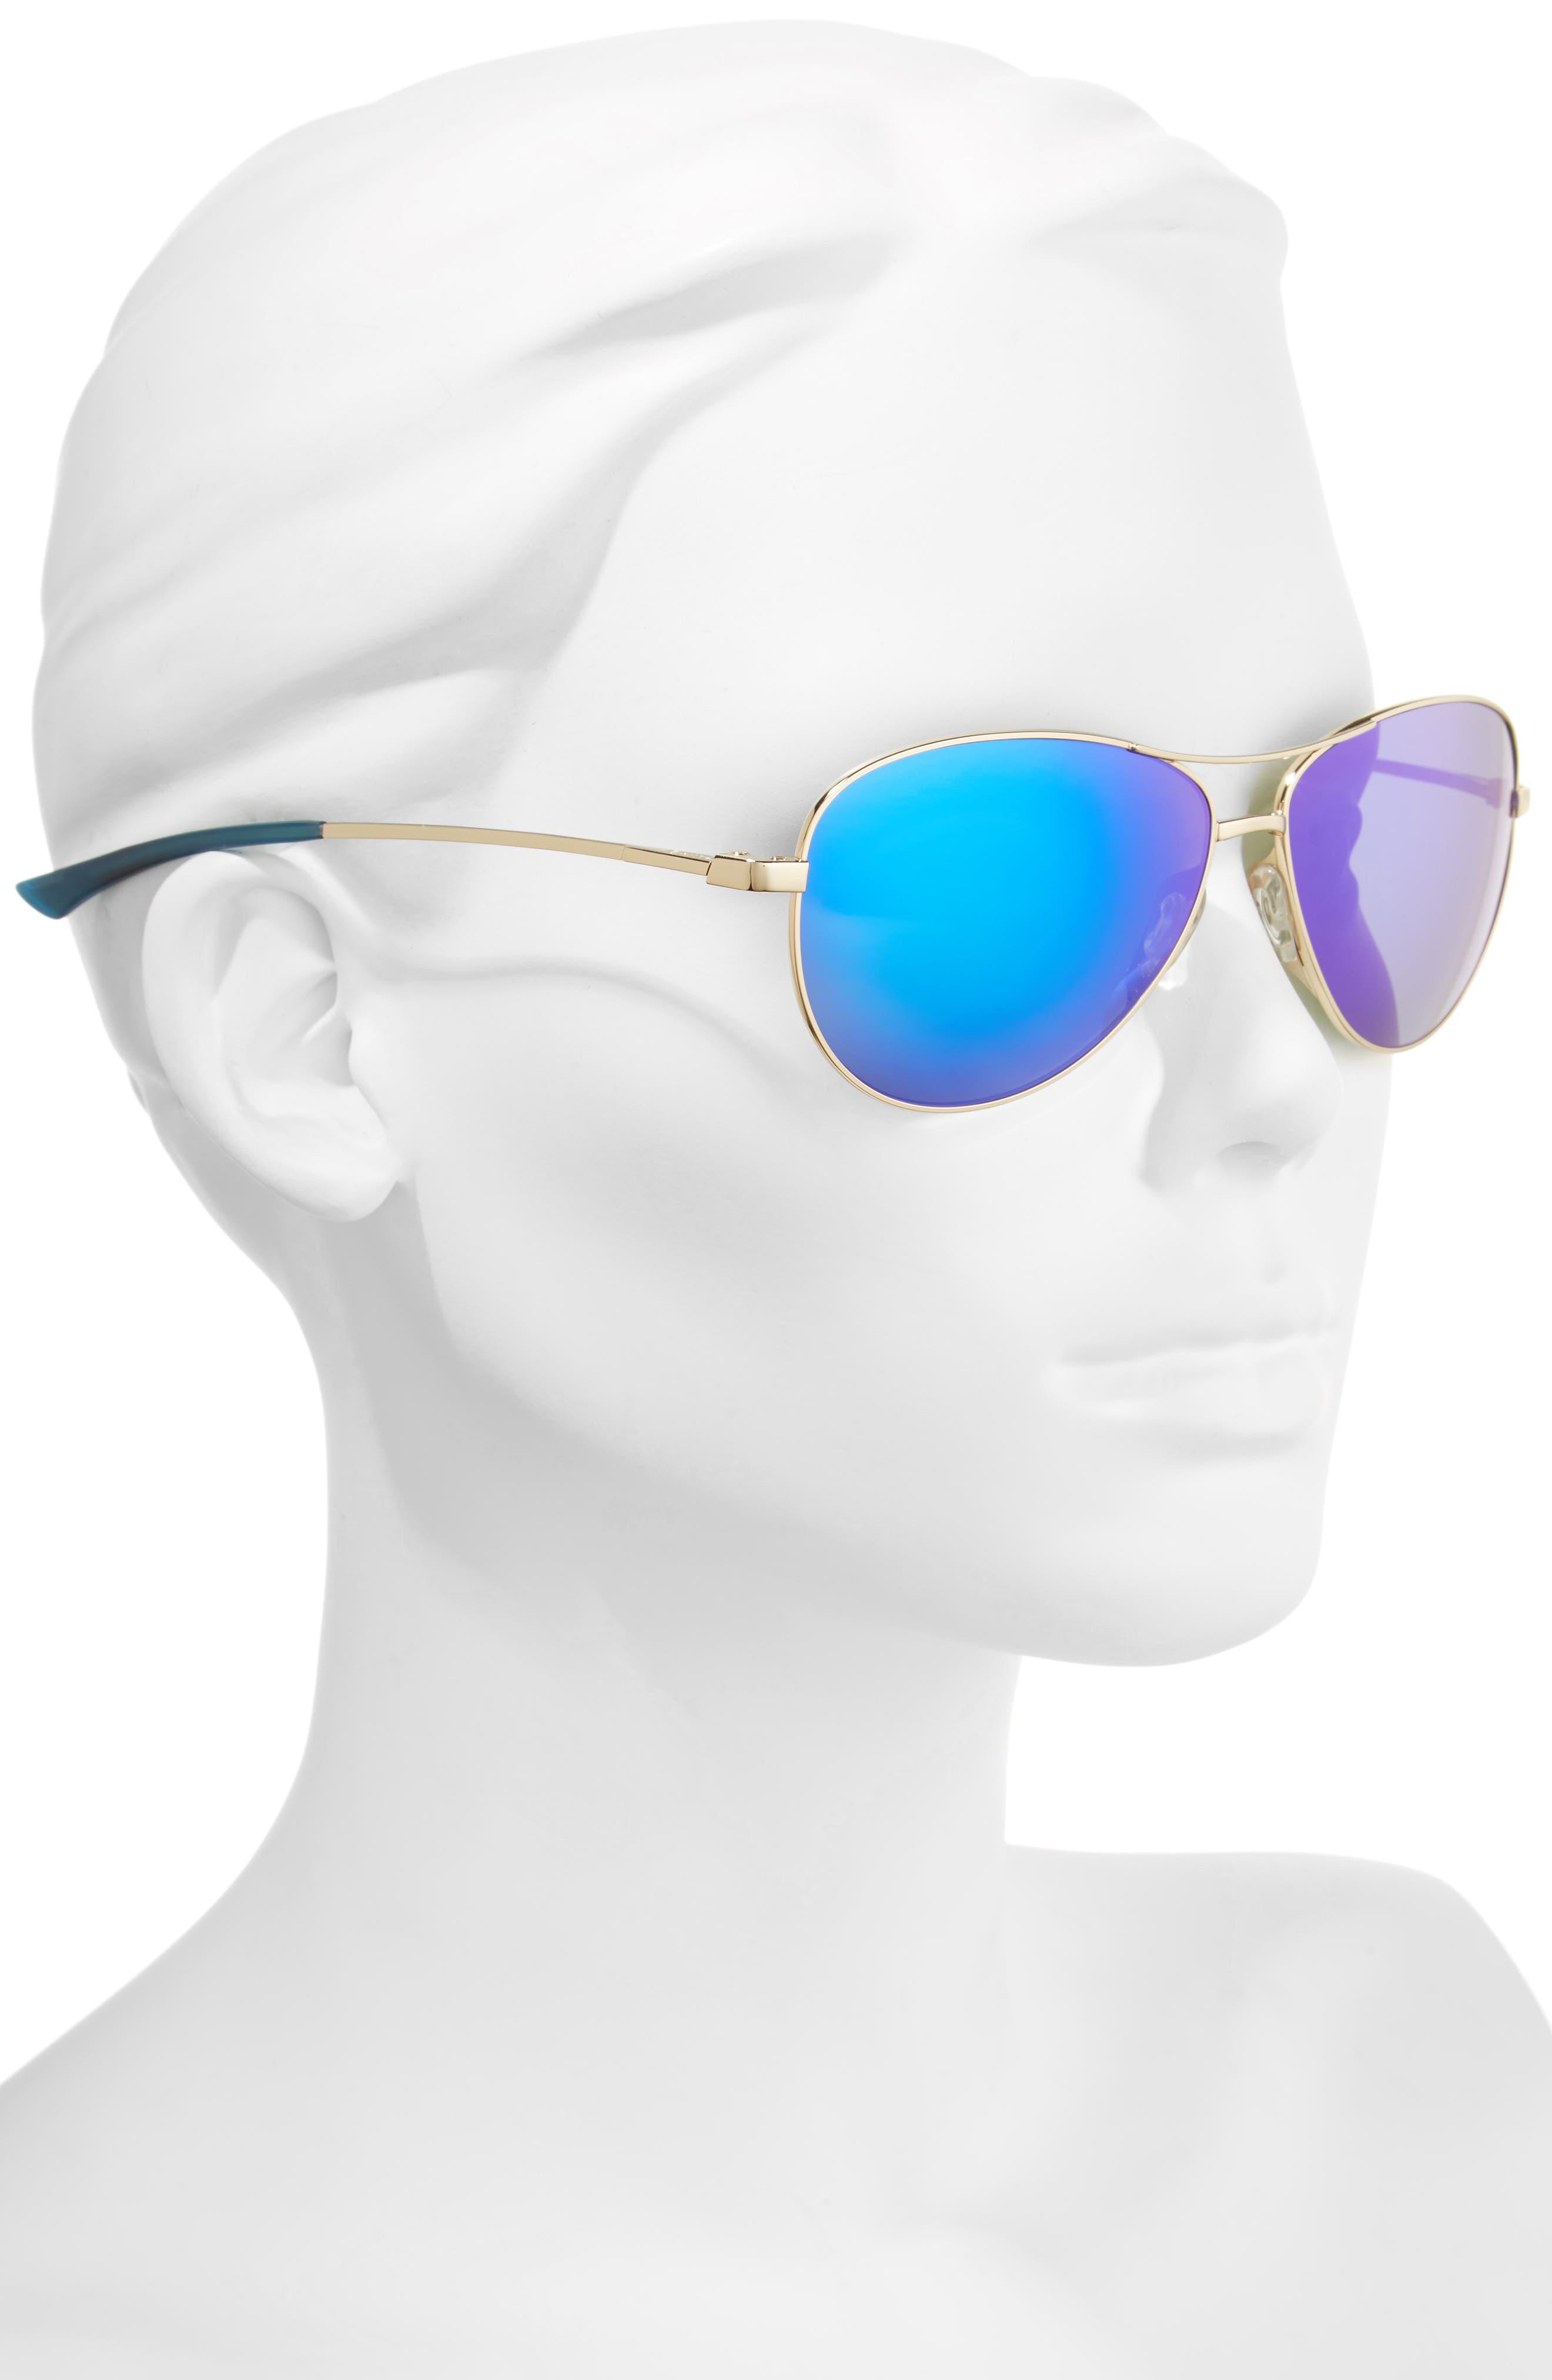 'Langley' 60mm Aviator Sunglasses,                             Alternate thumbnail 2, color,                             GOLD/ BLUE